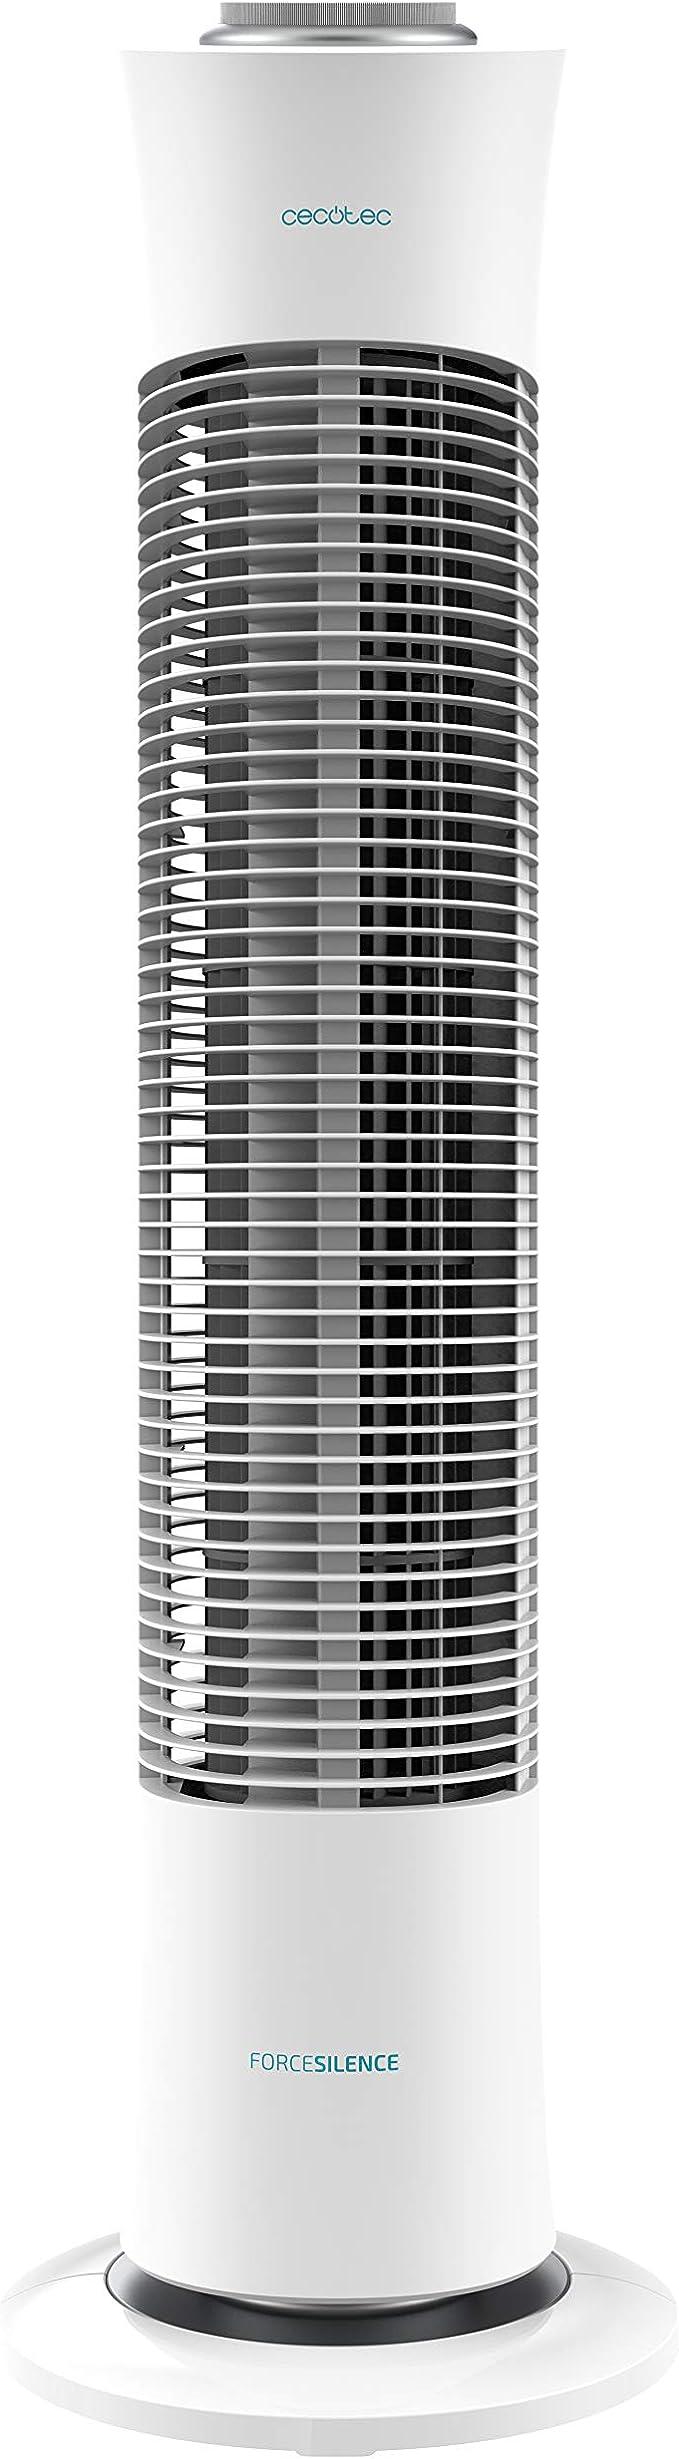 Cecotec Ventilador de Torre EnergySilence 6090 Skyline. 30 (76cm ...